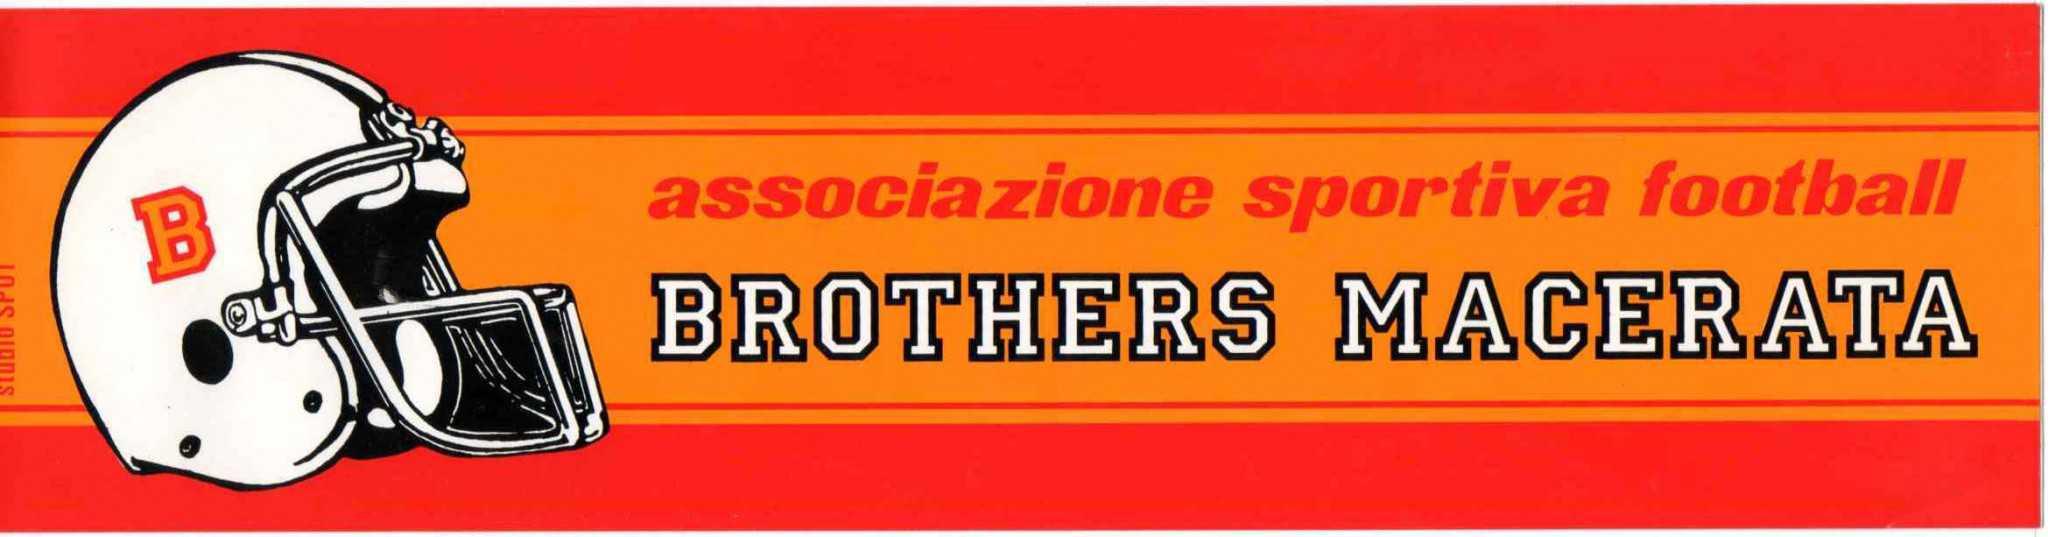 Bros 1